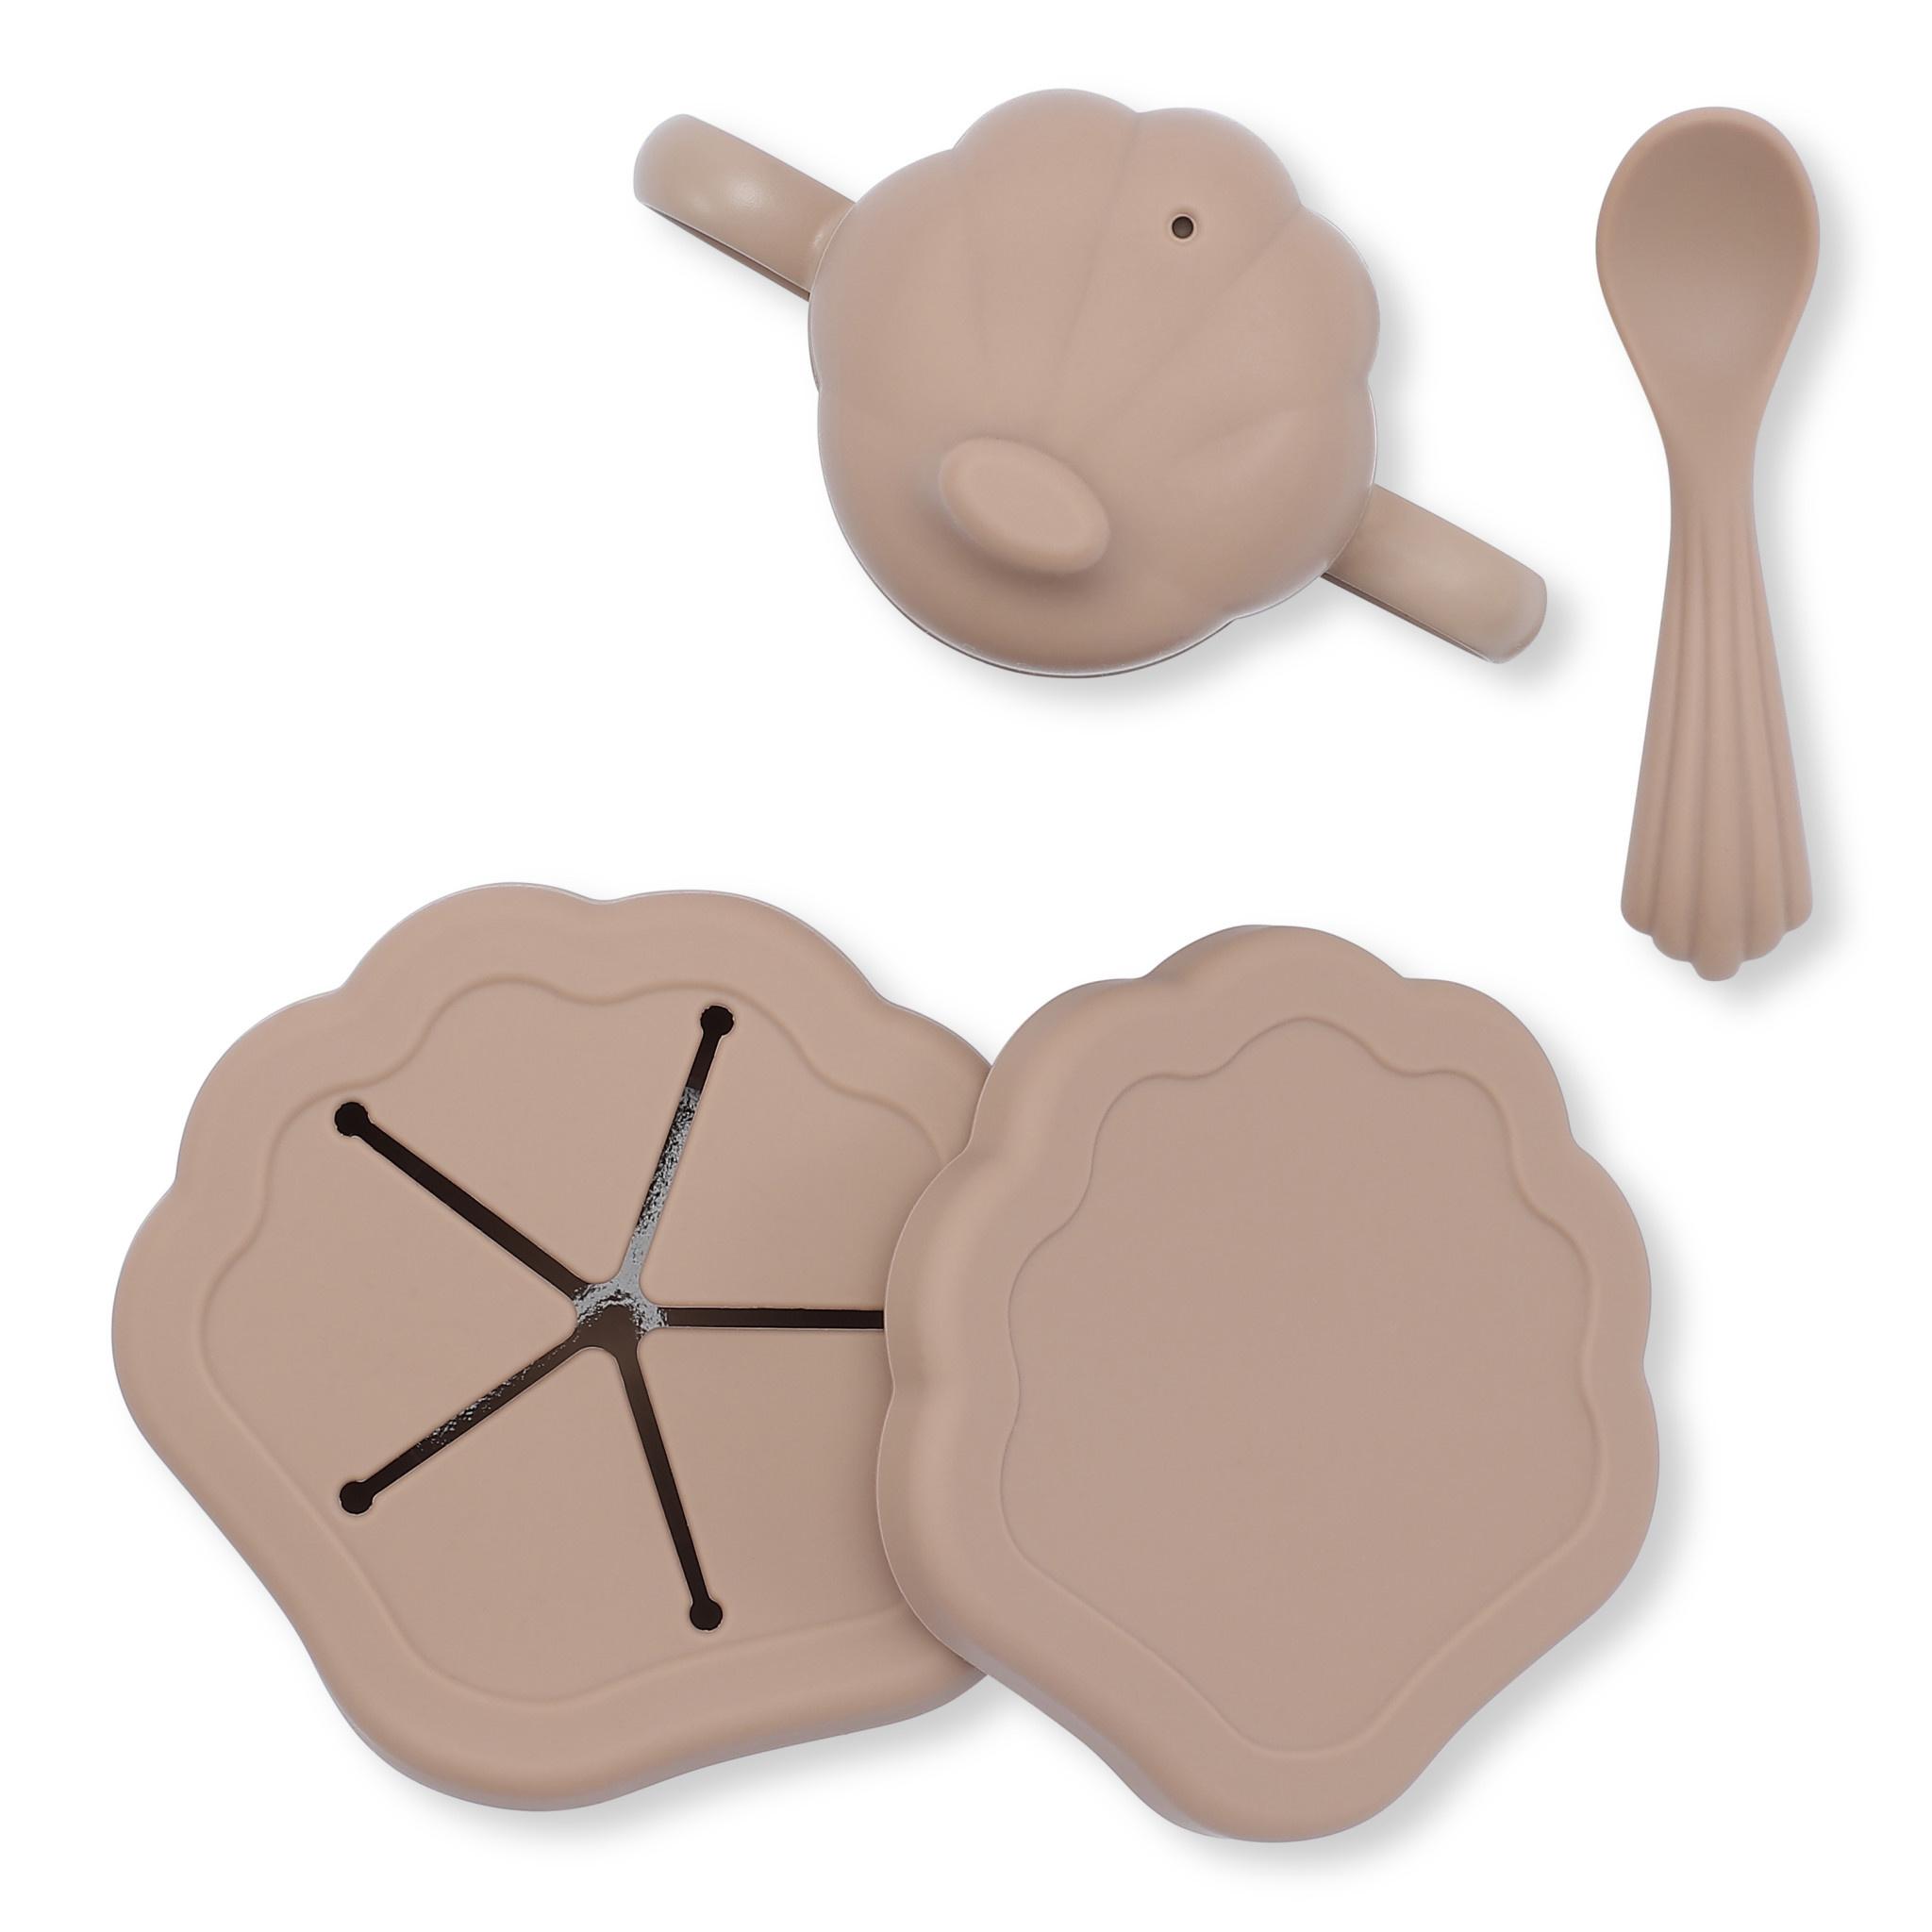 Silicone clam set blush-1